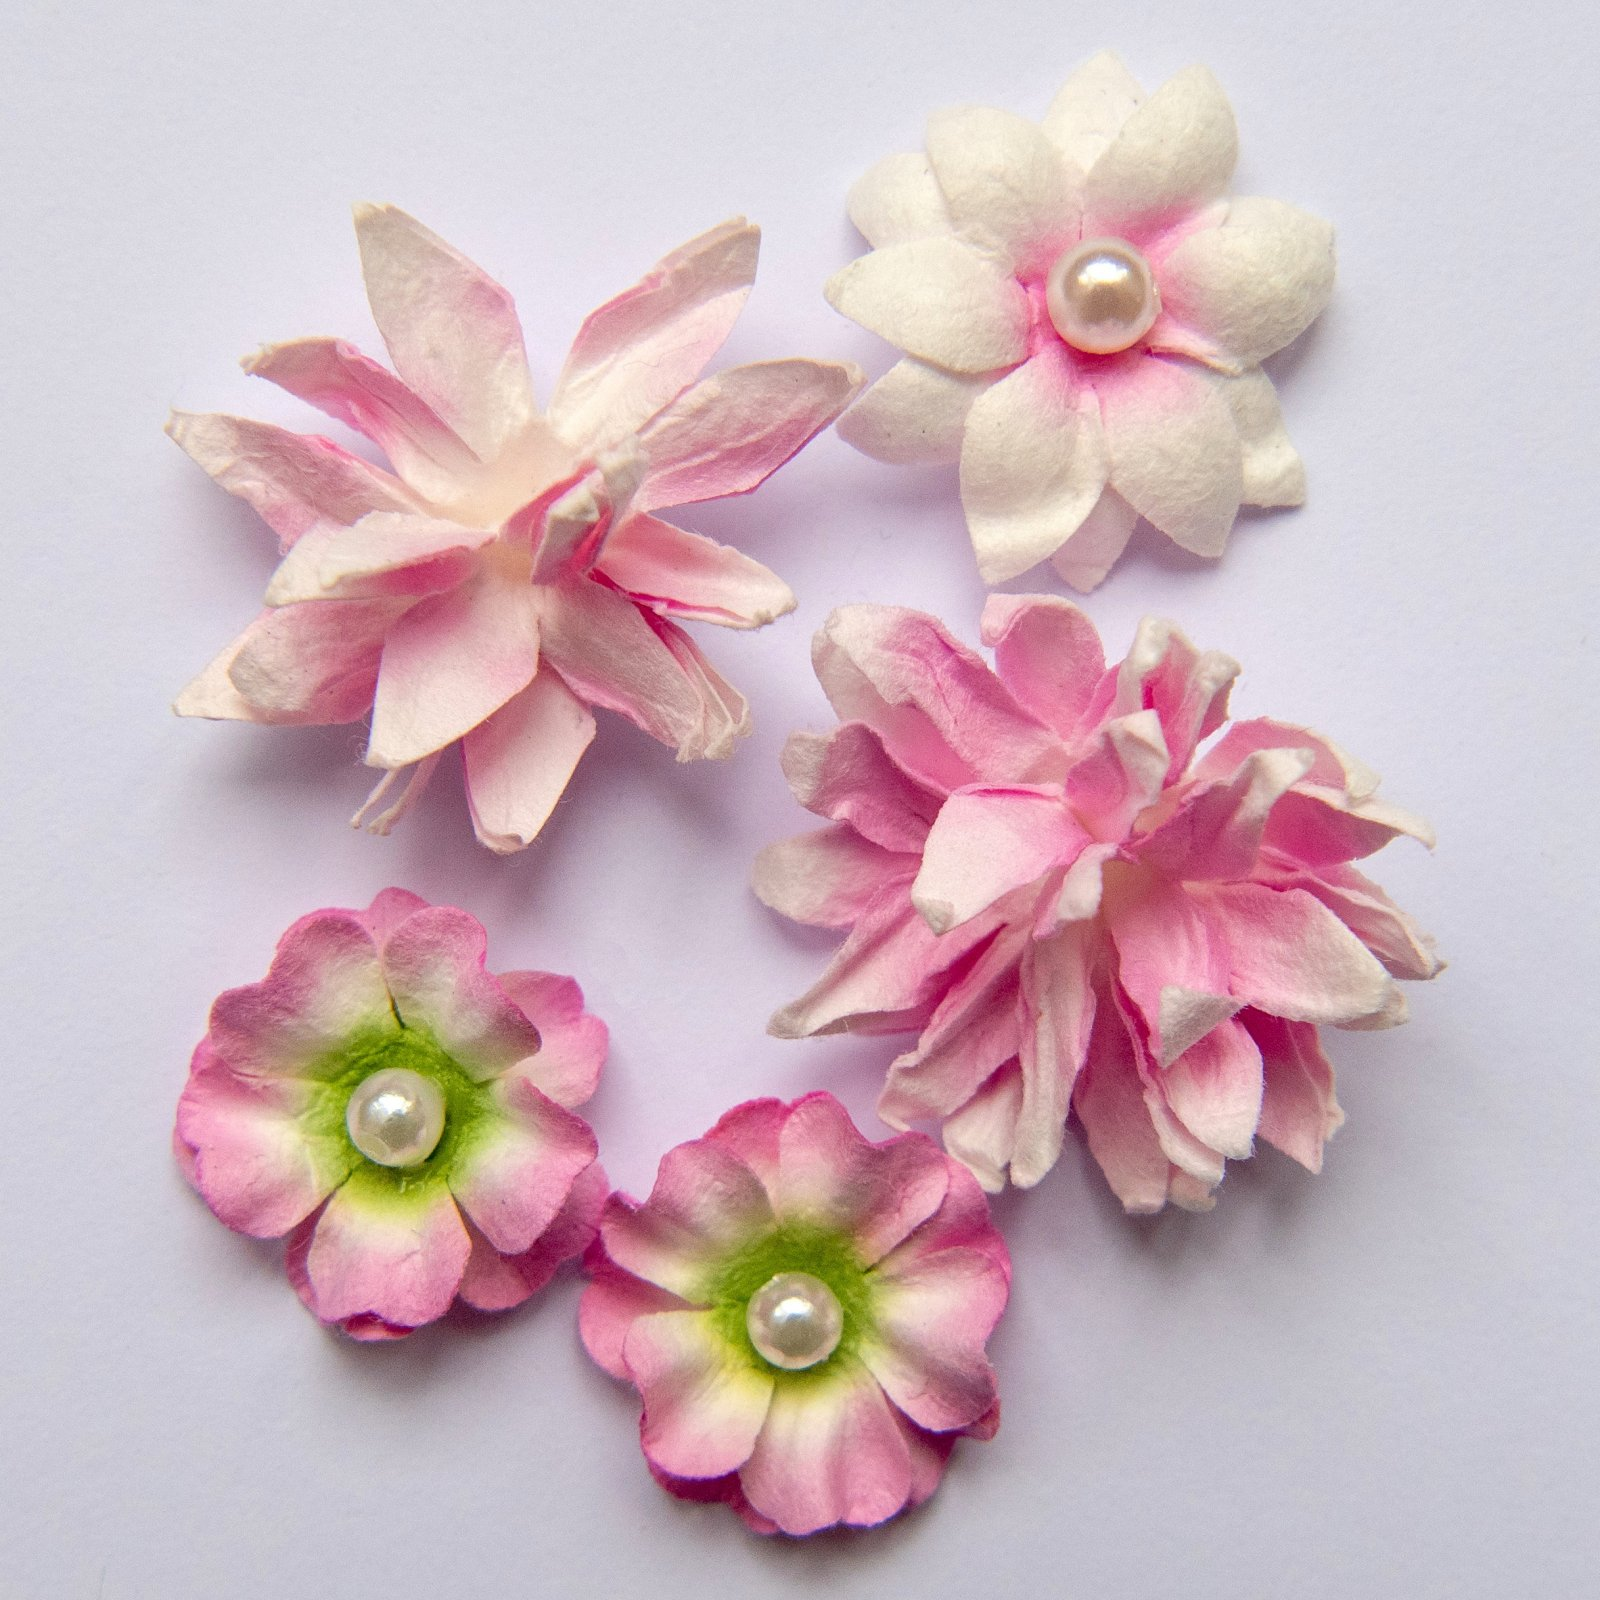 Flower mini series blush